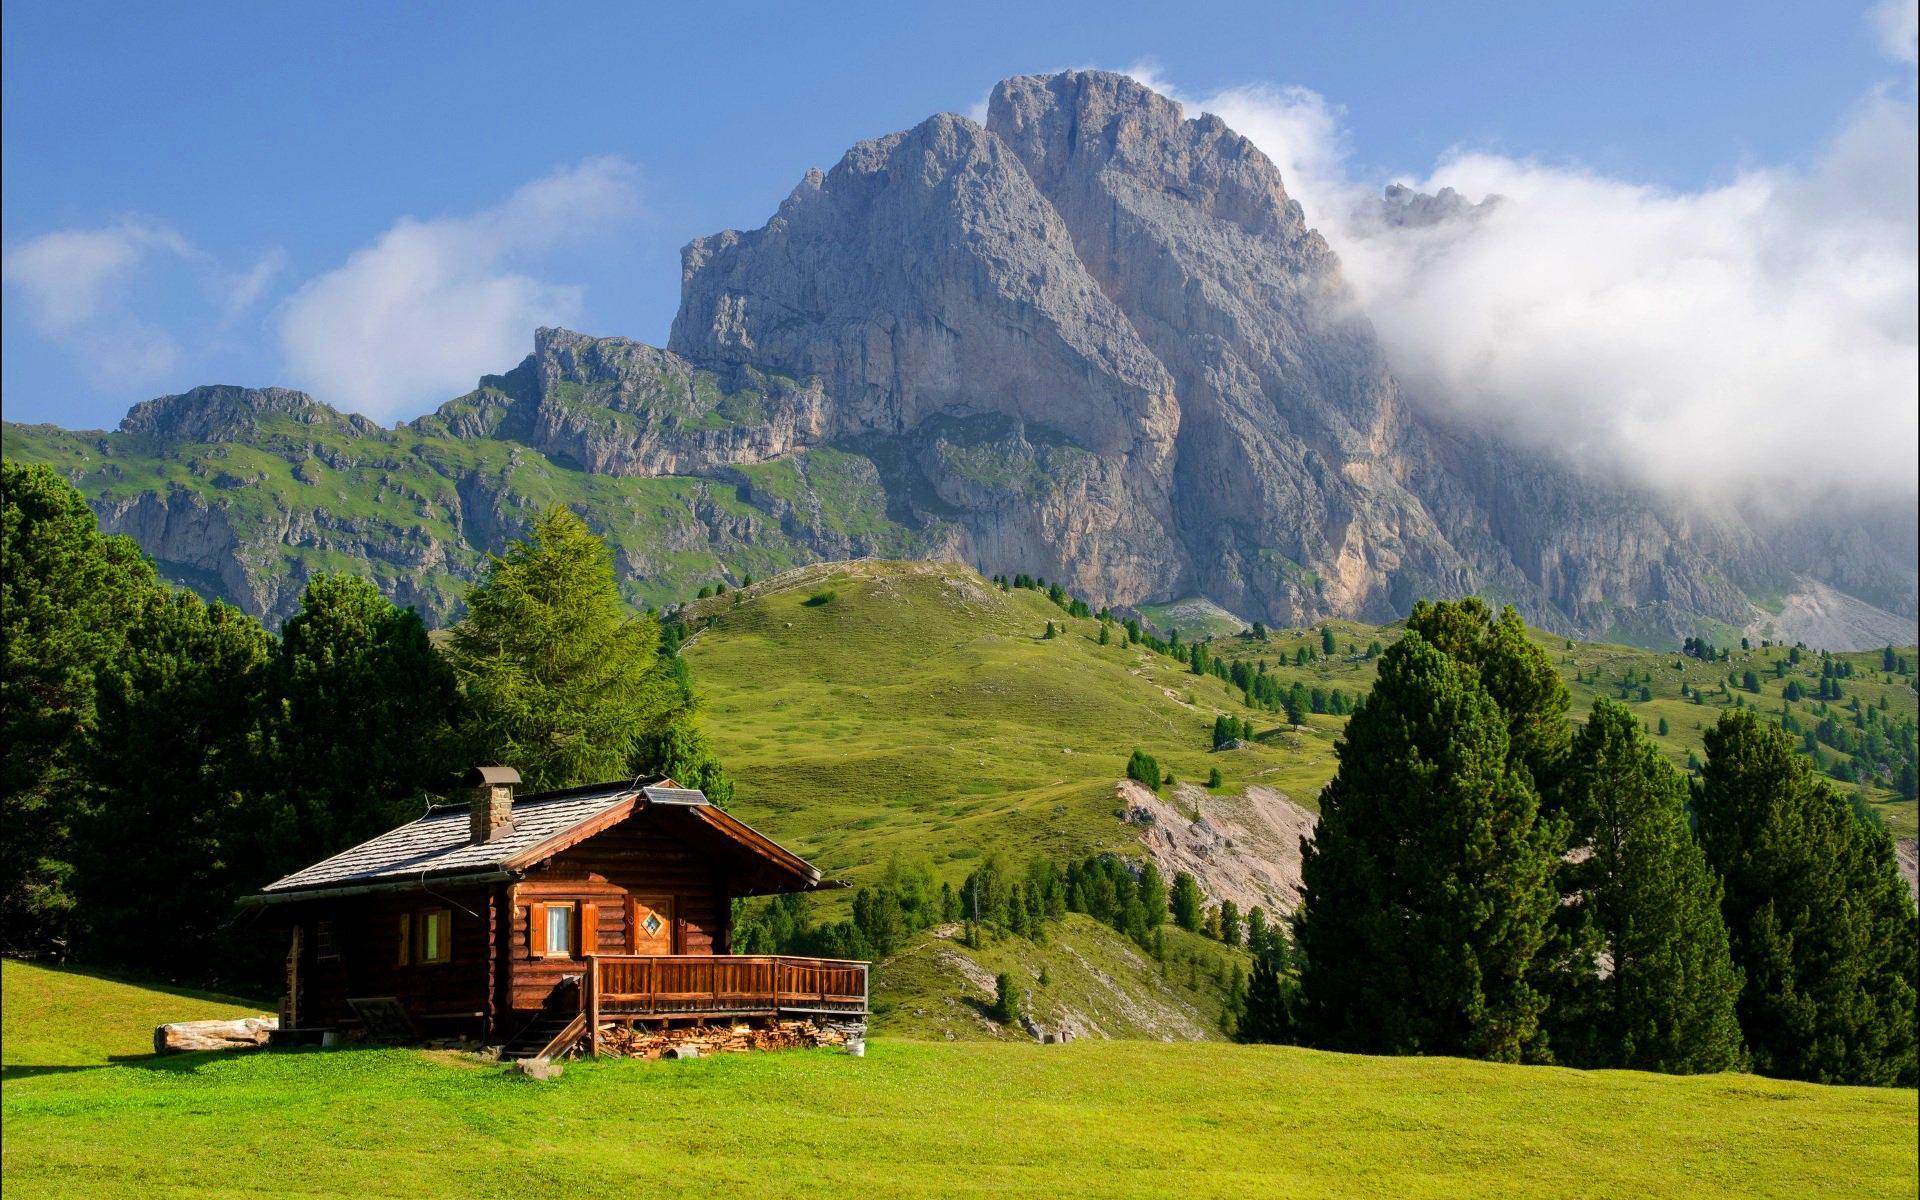 Kućice na  vrhu planine World___Italy_Lonely_house_in_the_ski_resort_of_Val_Gardena__Italy_062914_